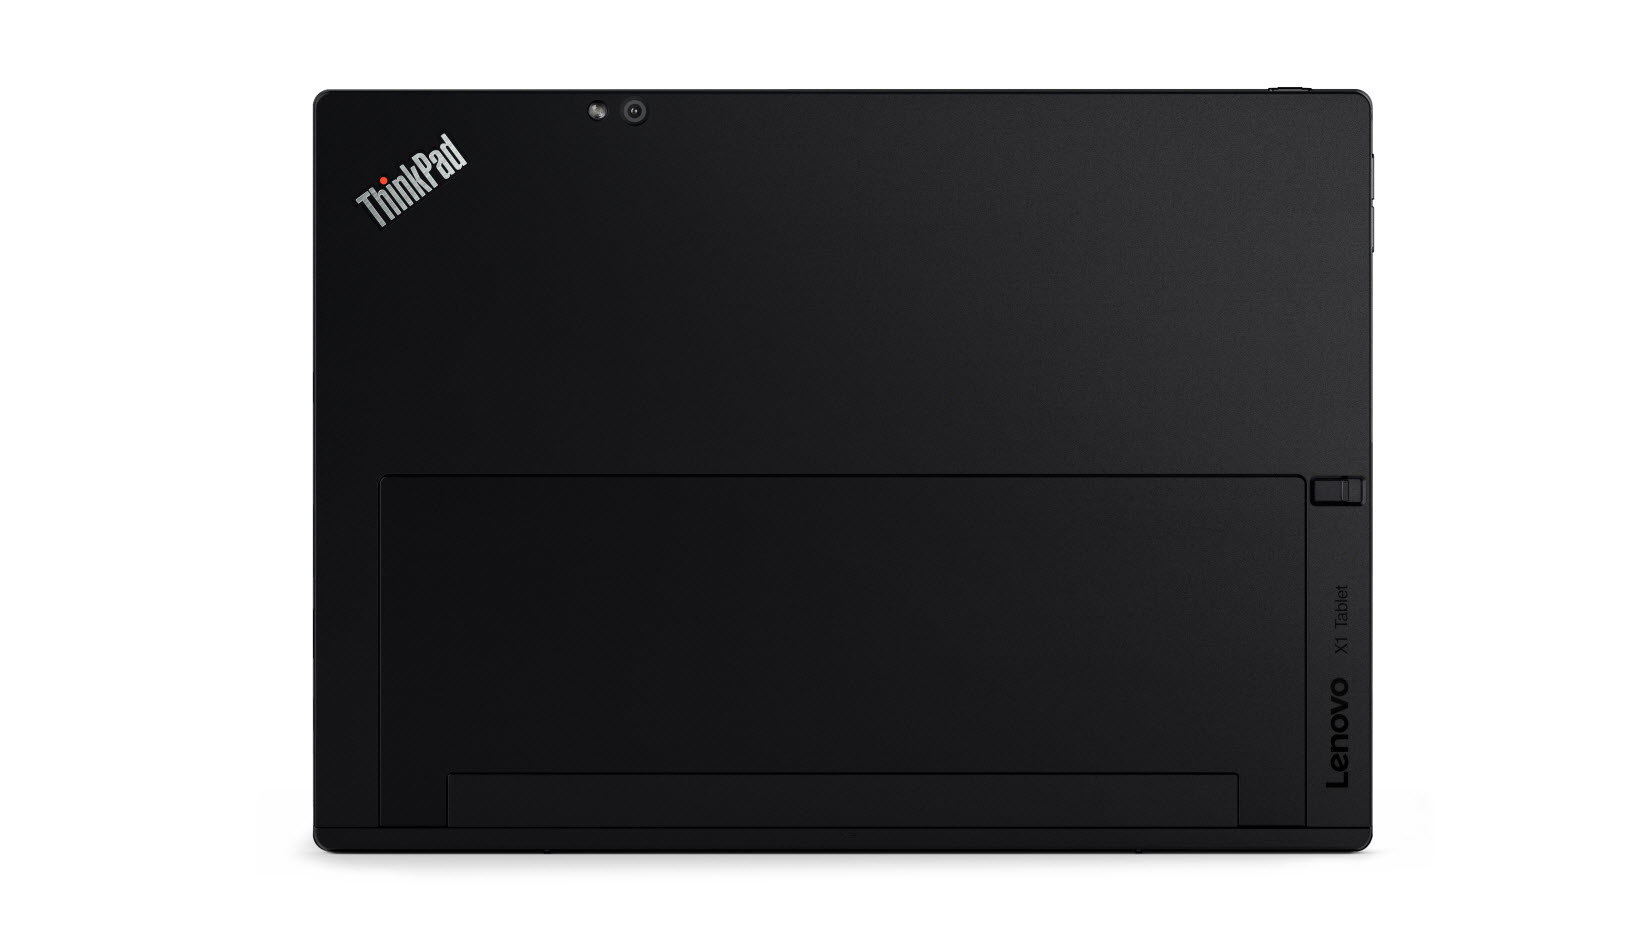 Lenovo ThinkPad X1 192GB 4G Nero tablet